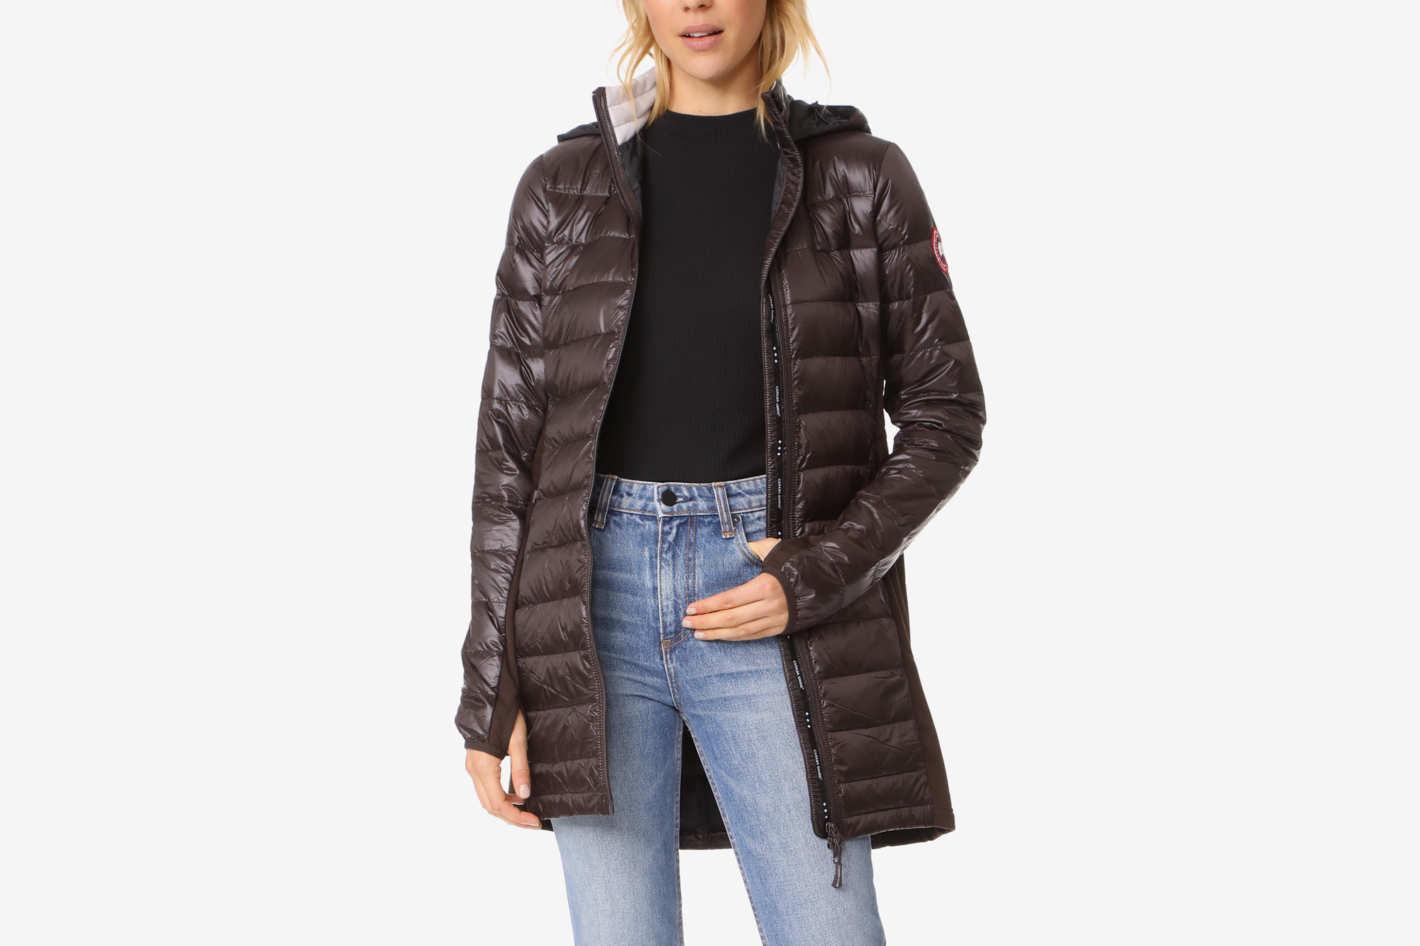 canada goose jacket price list